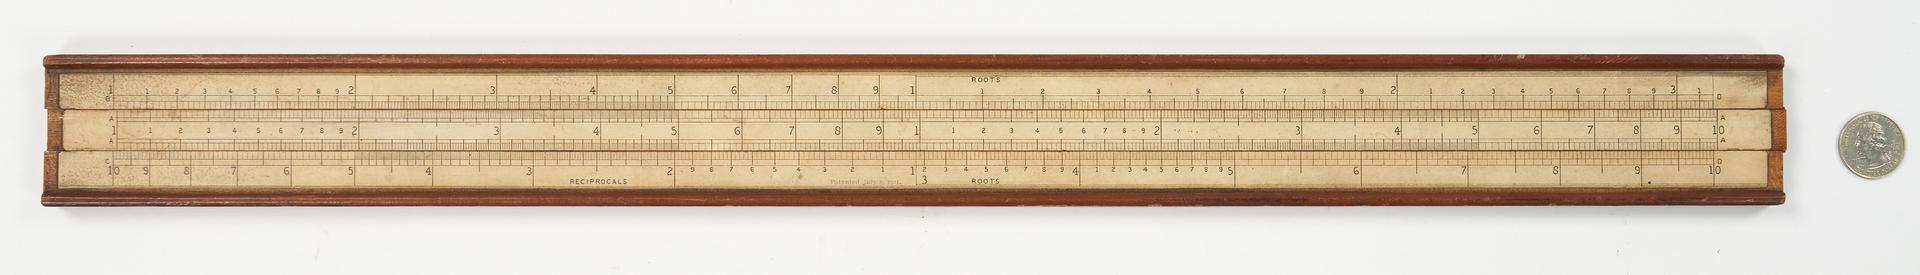 Lot 793: E.M. Scofield: The Engineers Slide Rule